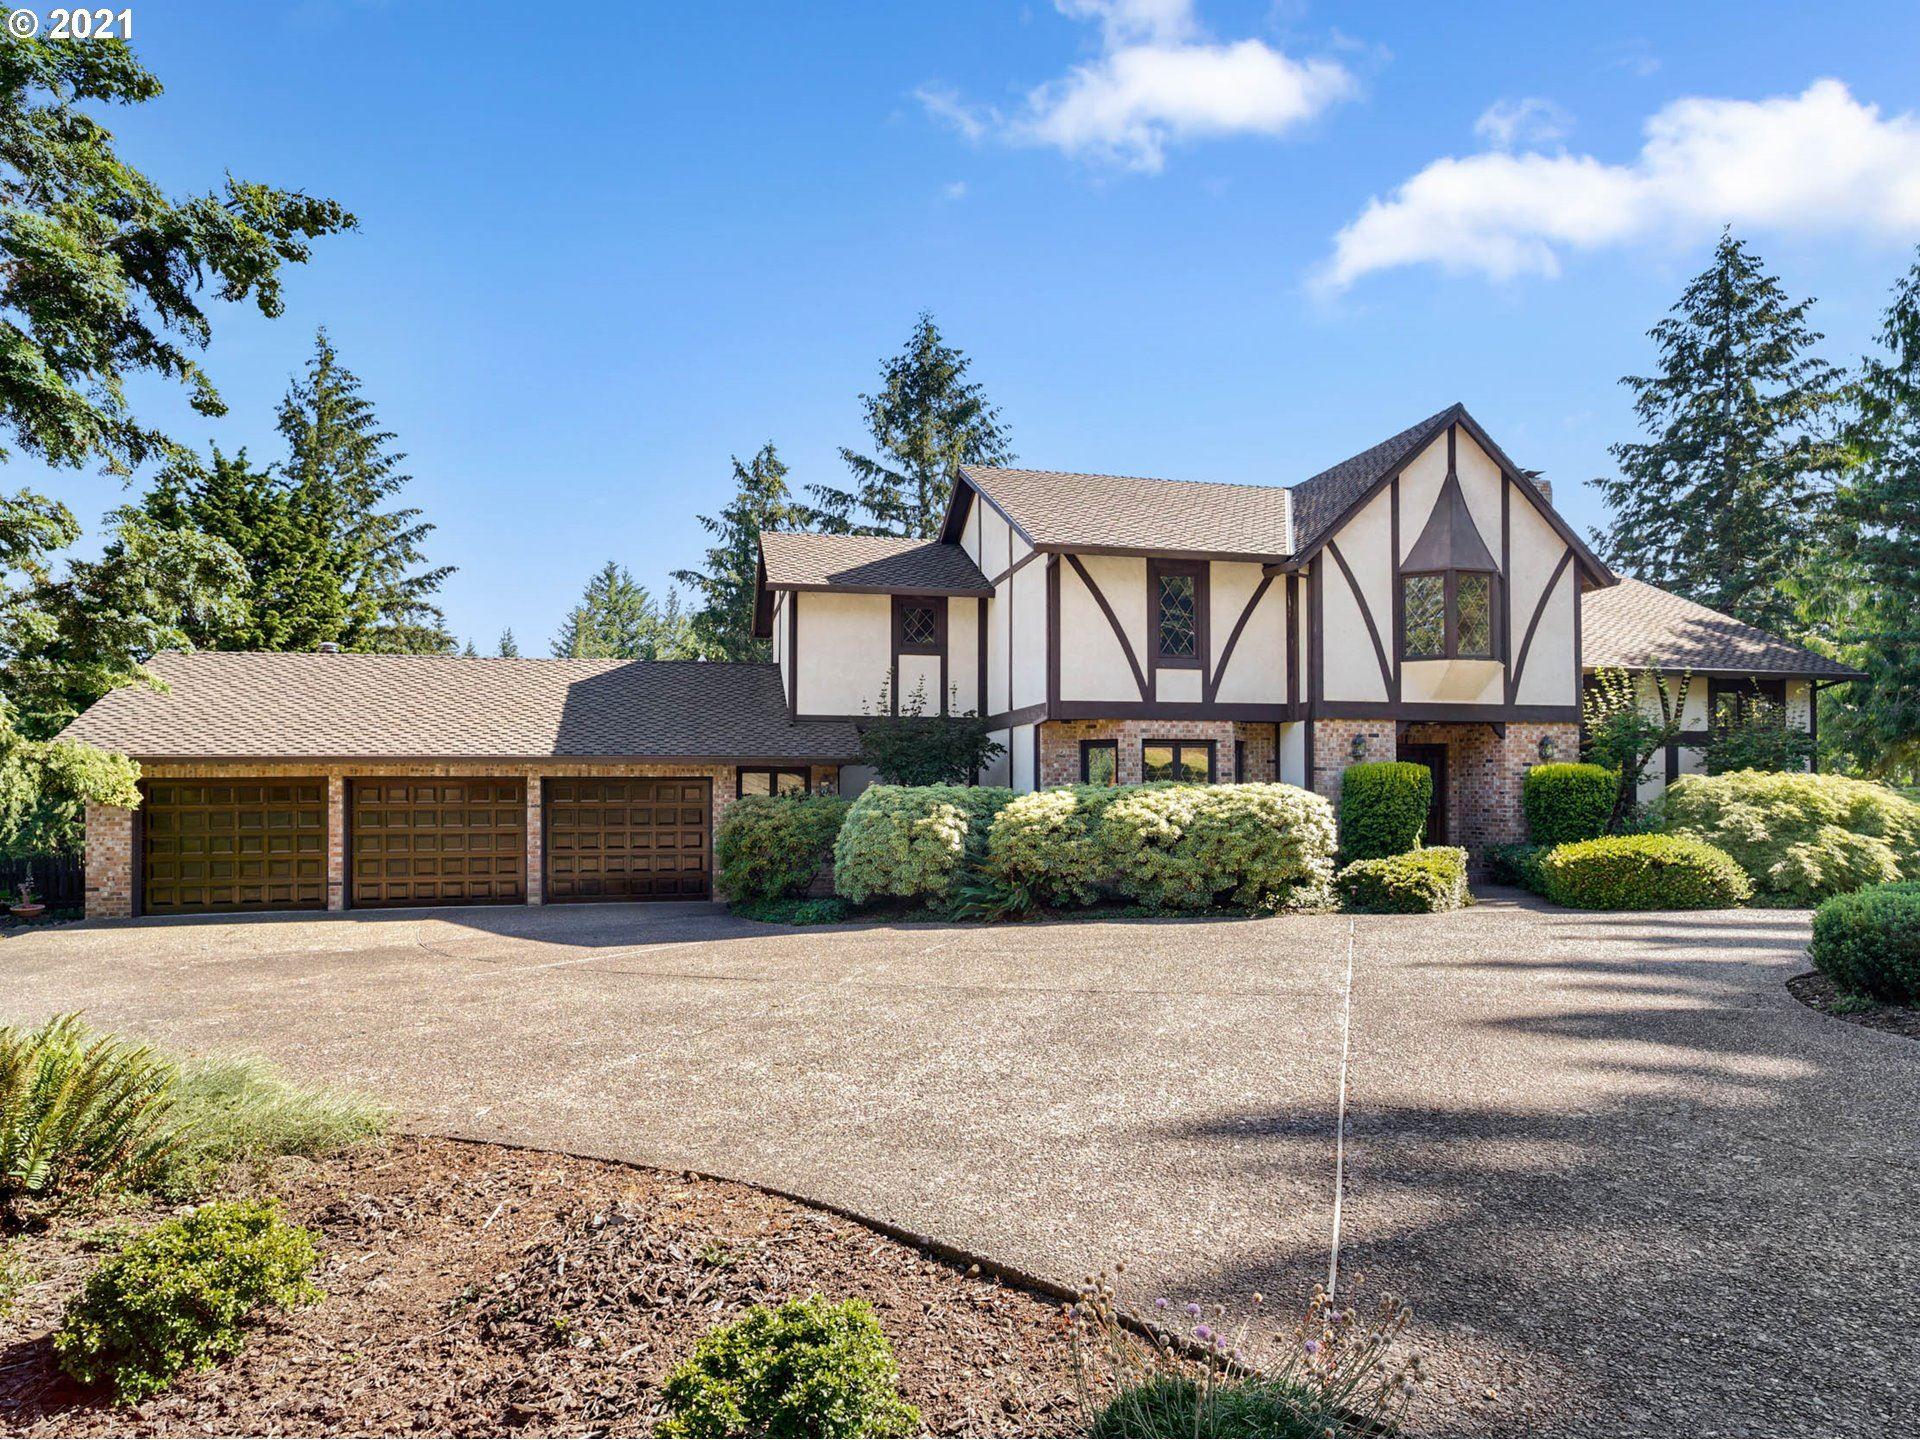 9317 NW KAISER RD, Portland, OR 97231 - MLS#: 21600848